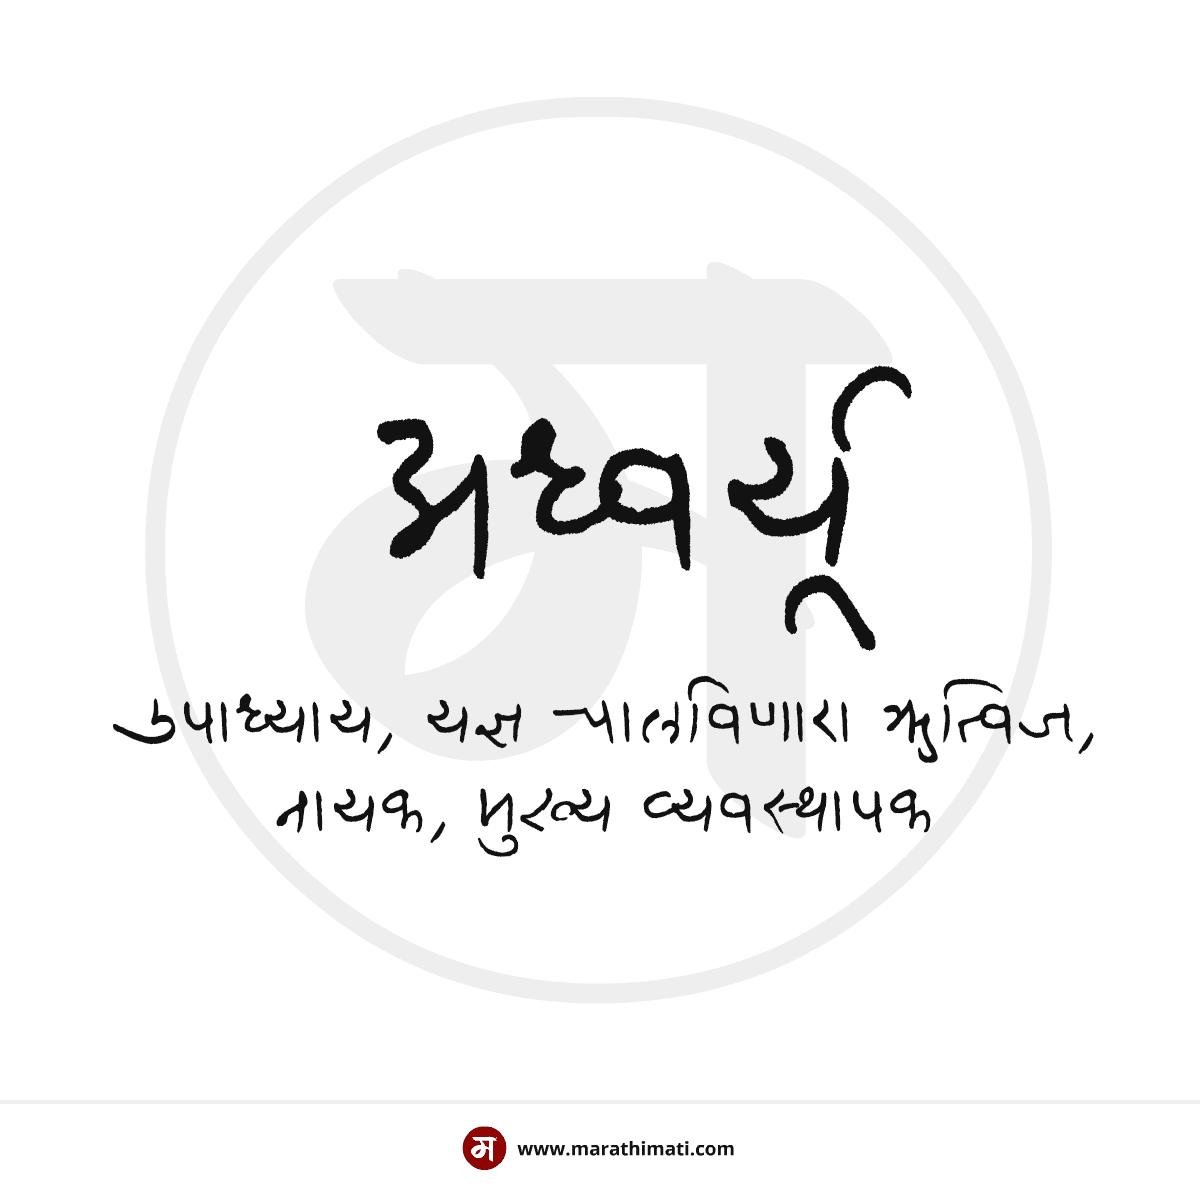 मराठी शब्द | Marathi Shabd